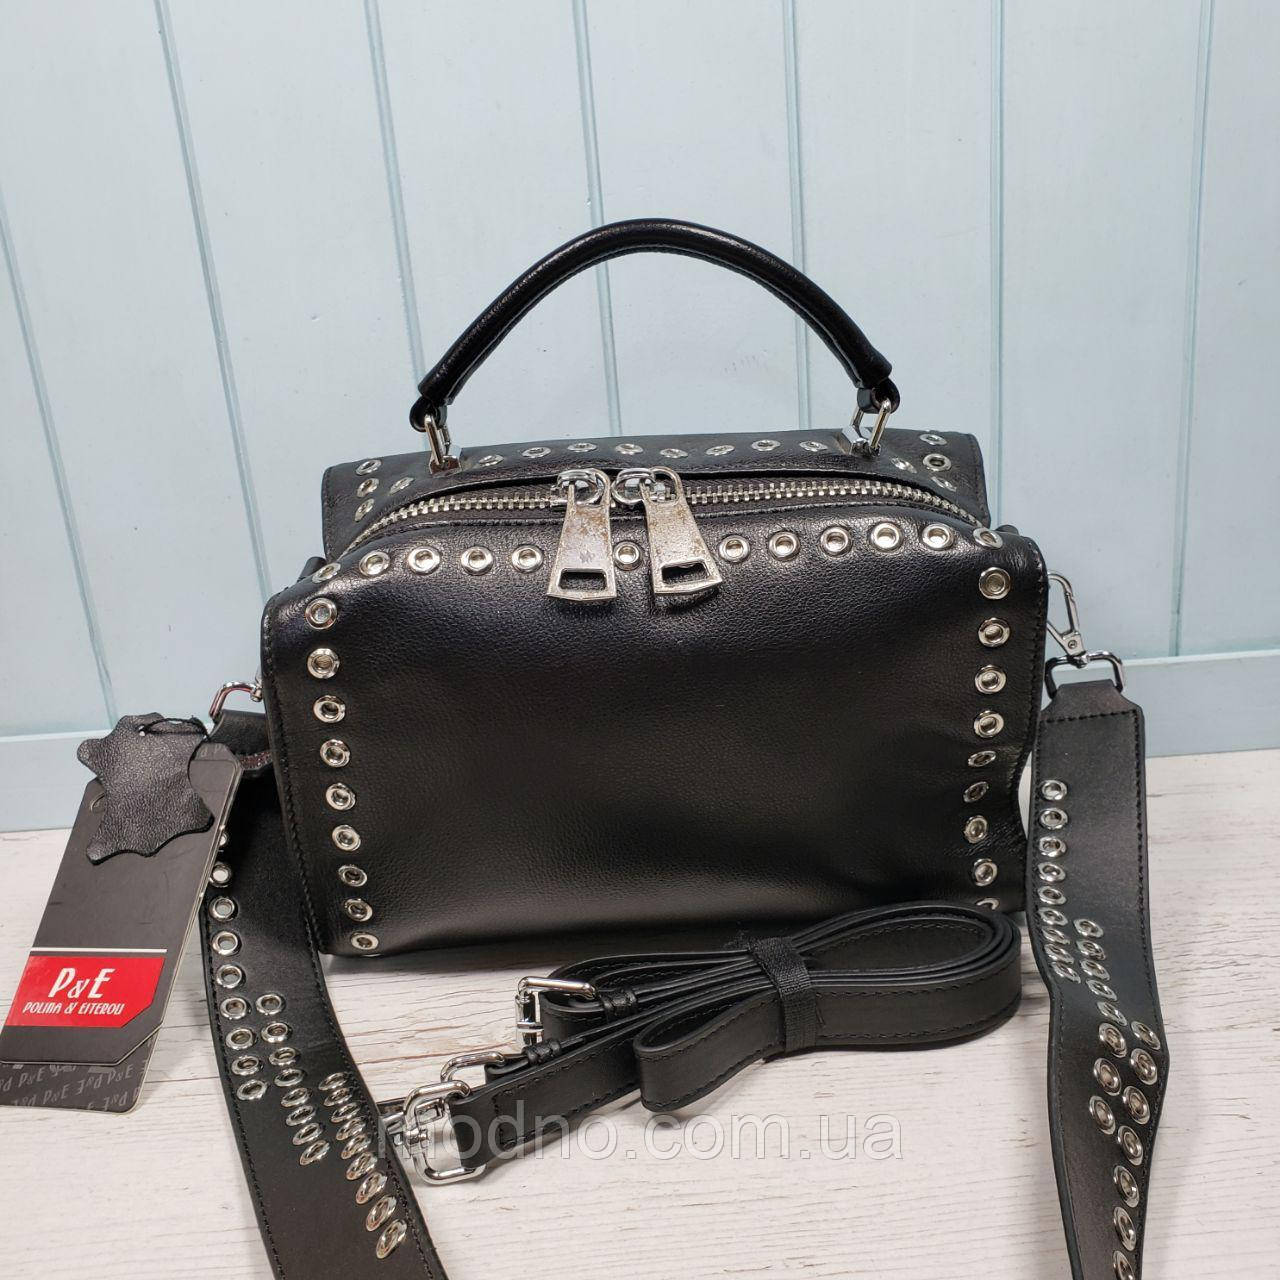 eb4462a2f Женская кожаная сумка Polina & Eiterou - Интернет-магазин